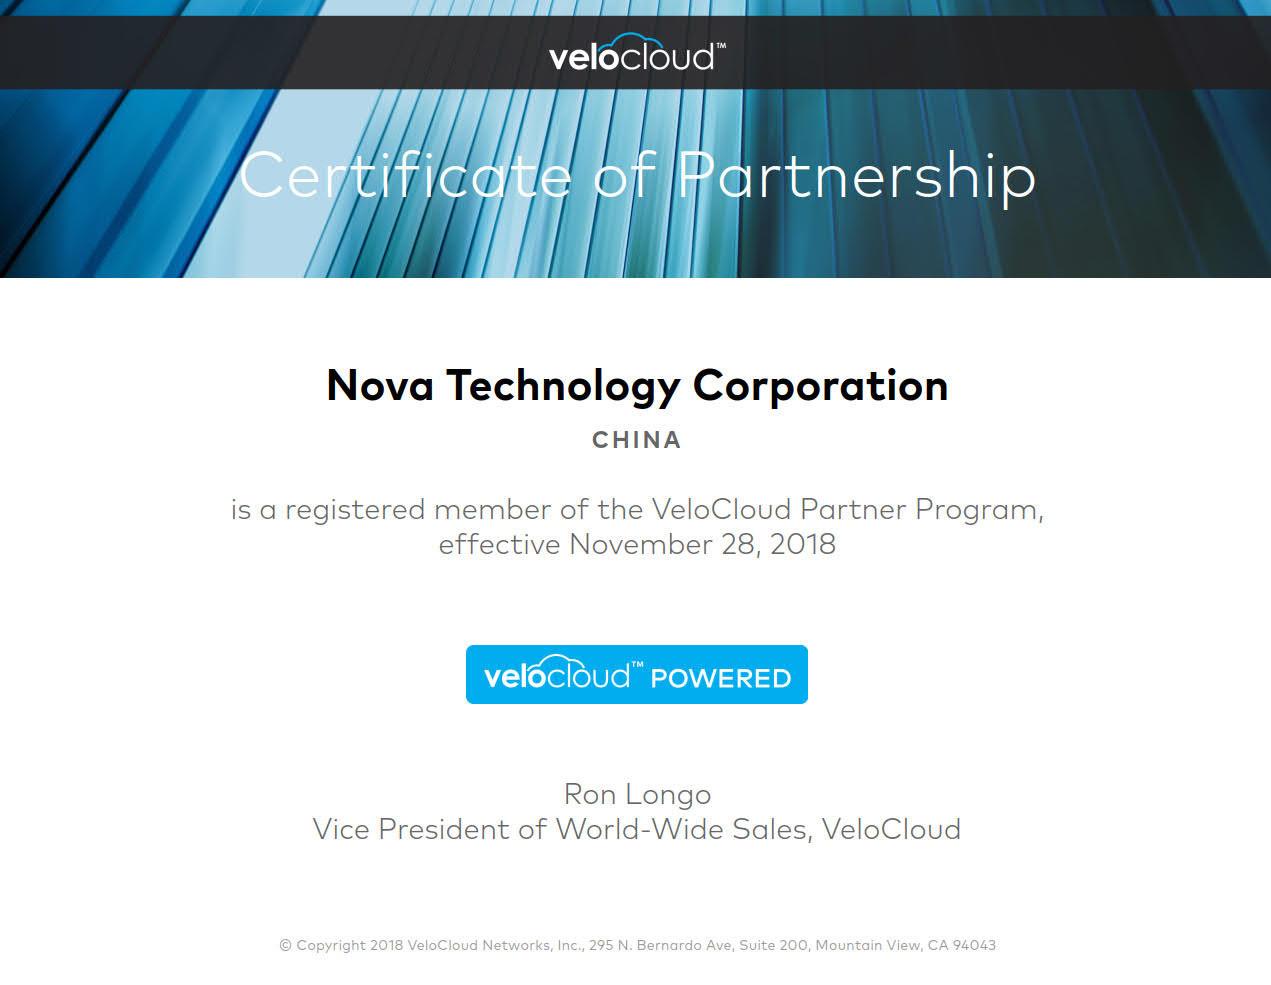 <strong>澳门百老汇网址</strong>科技与VeloCloud达成战略合作,携手为企业用户创造新价值